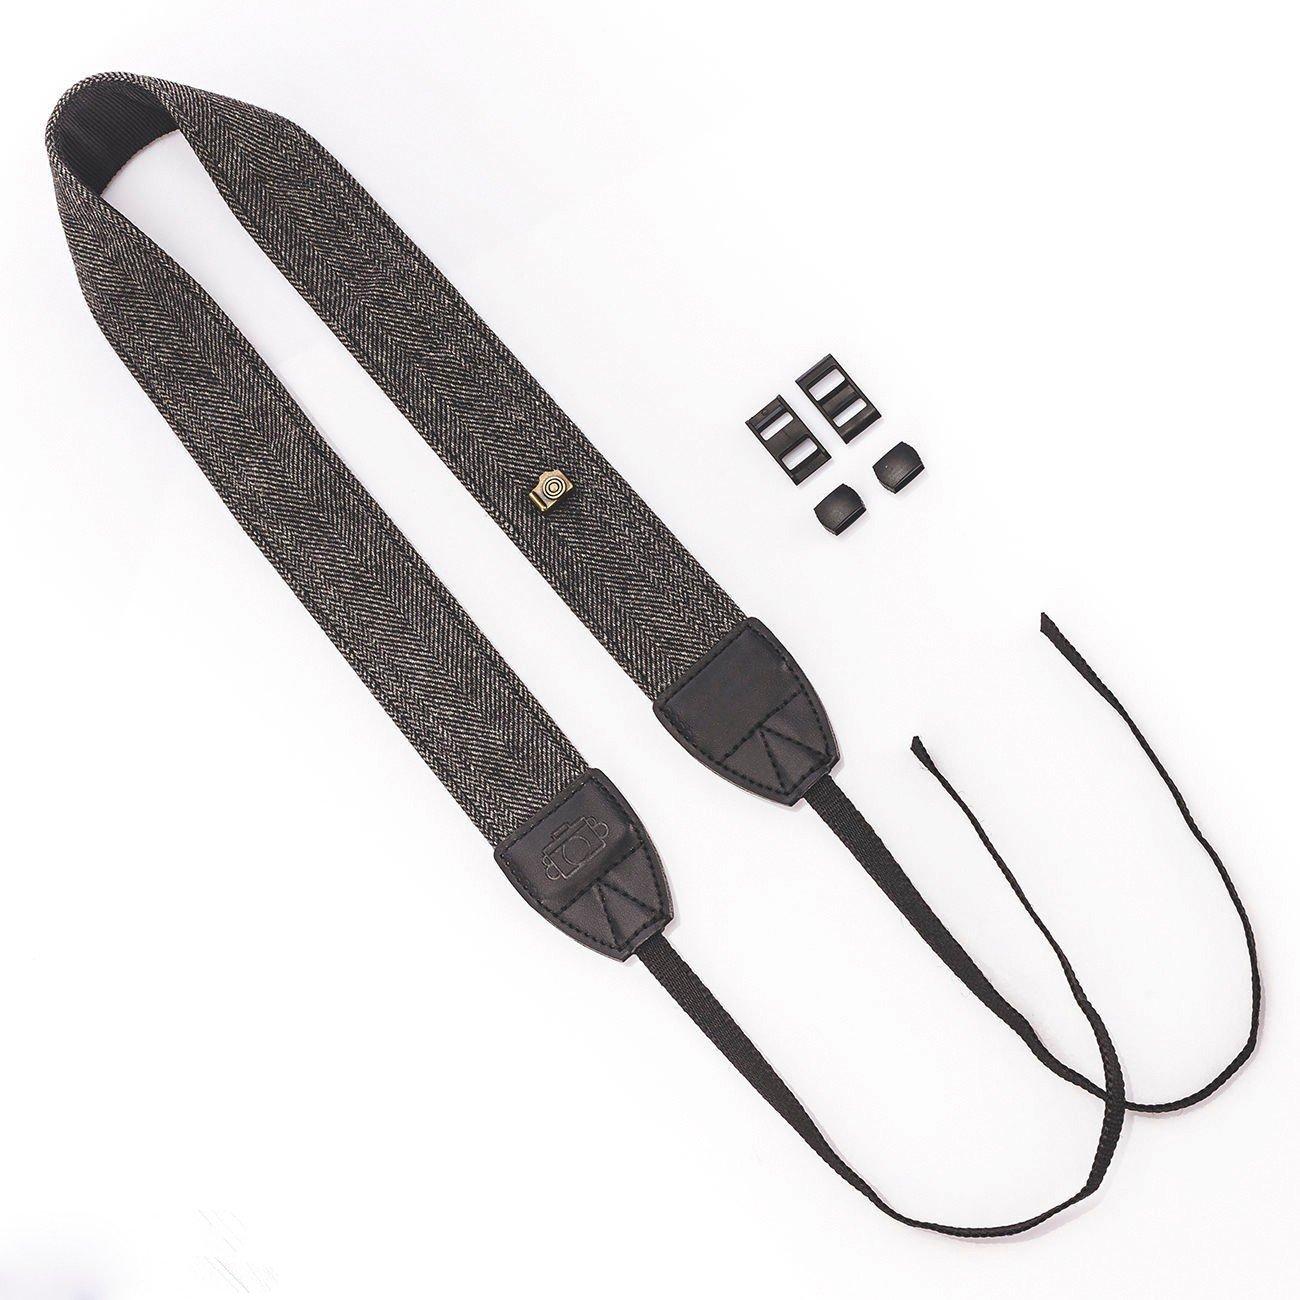 EXMAX® Camera Shoulder Neck Vintage Cotton Strap Belt for Sony Nikon Canon Olympus DSLR Black